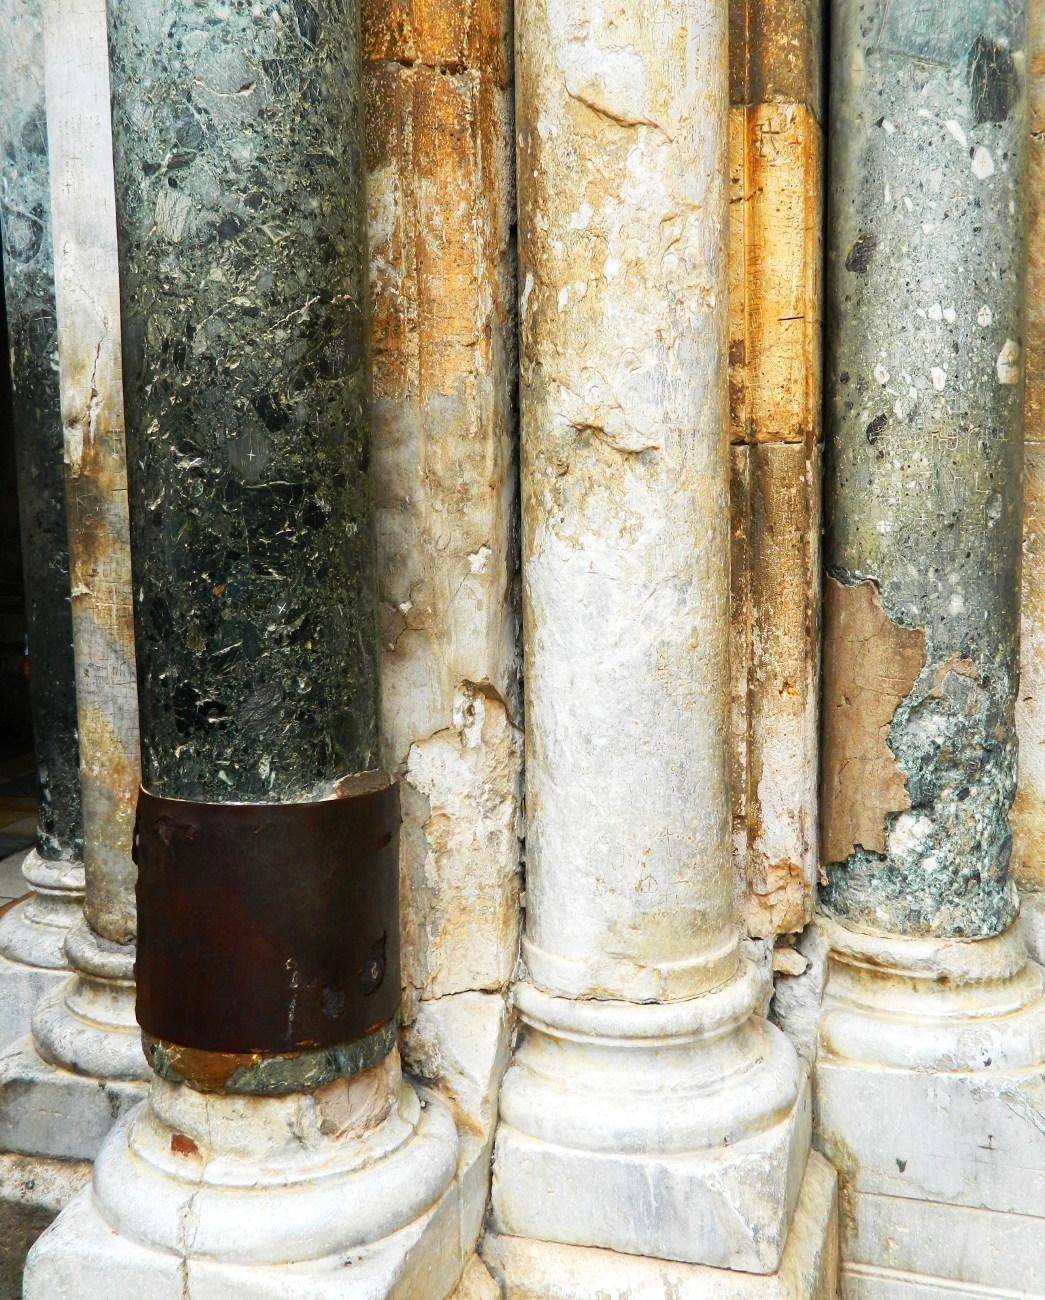 jerusalem pillars